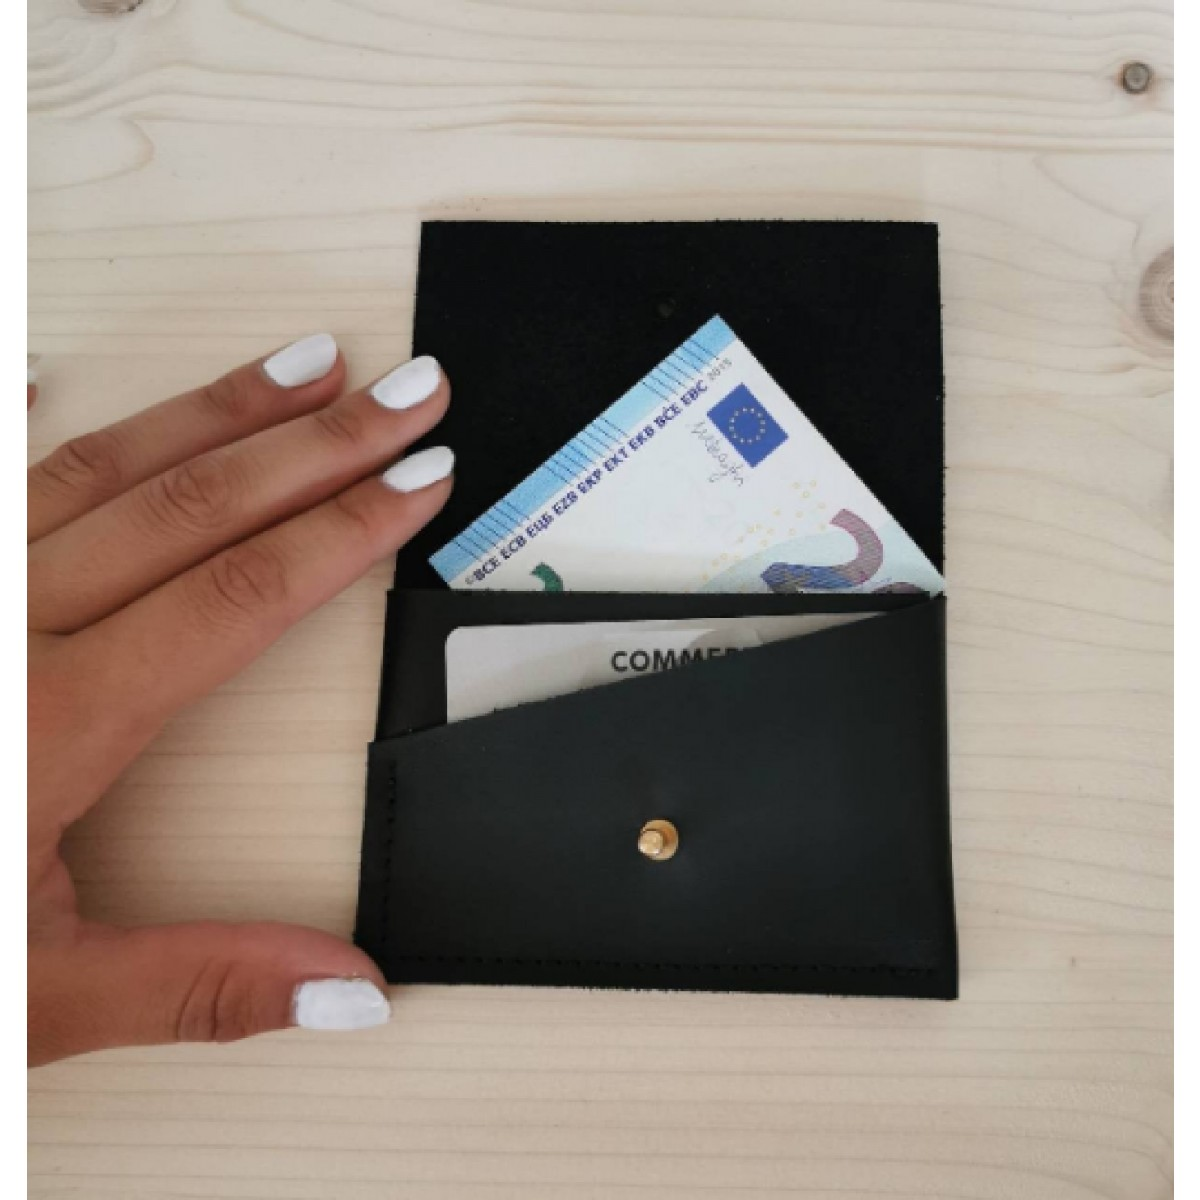 BSaite /  Schwarzes Mini Leder Portemonnaie / kleine Leder Geldbörse / Leder Kartenetui / tiny wallet